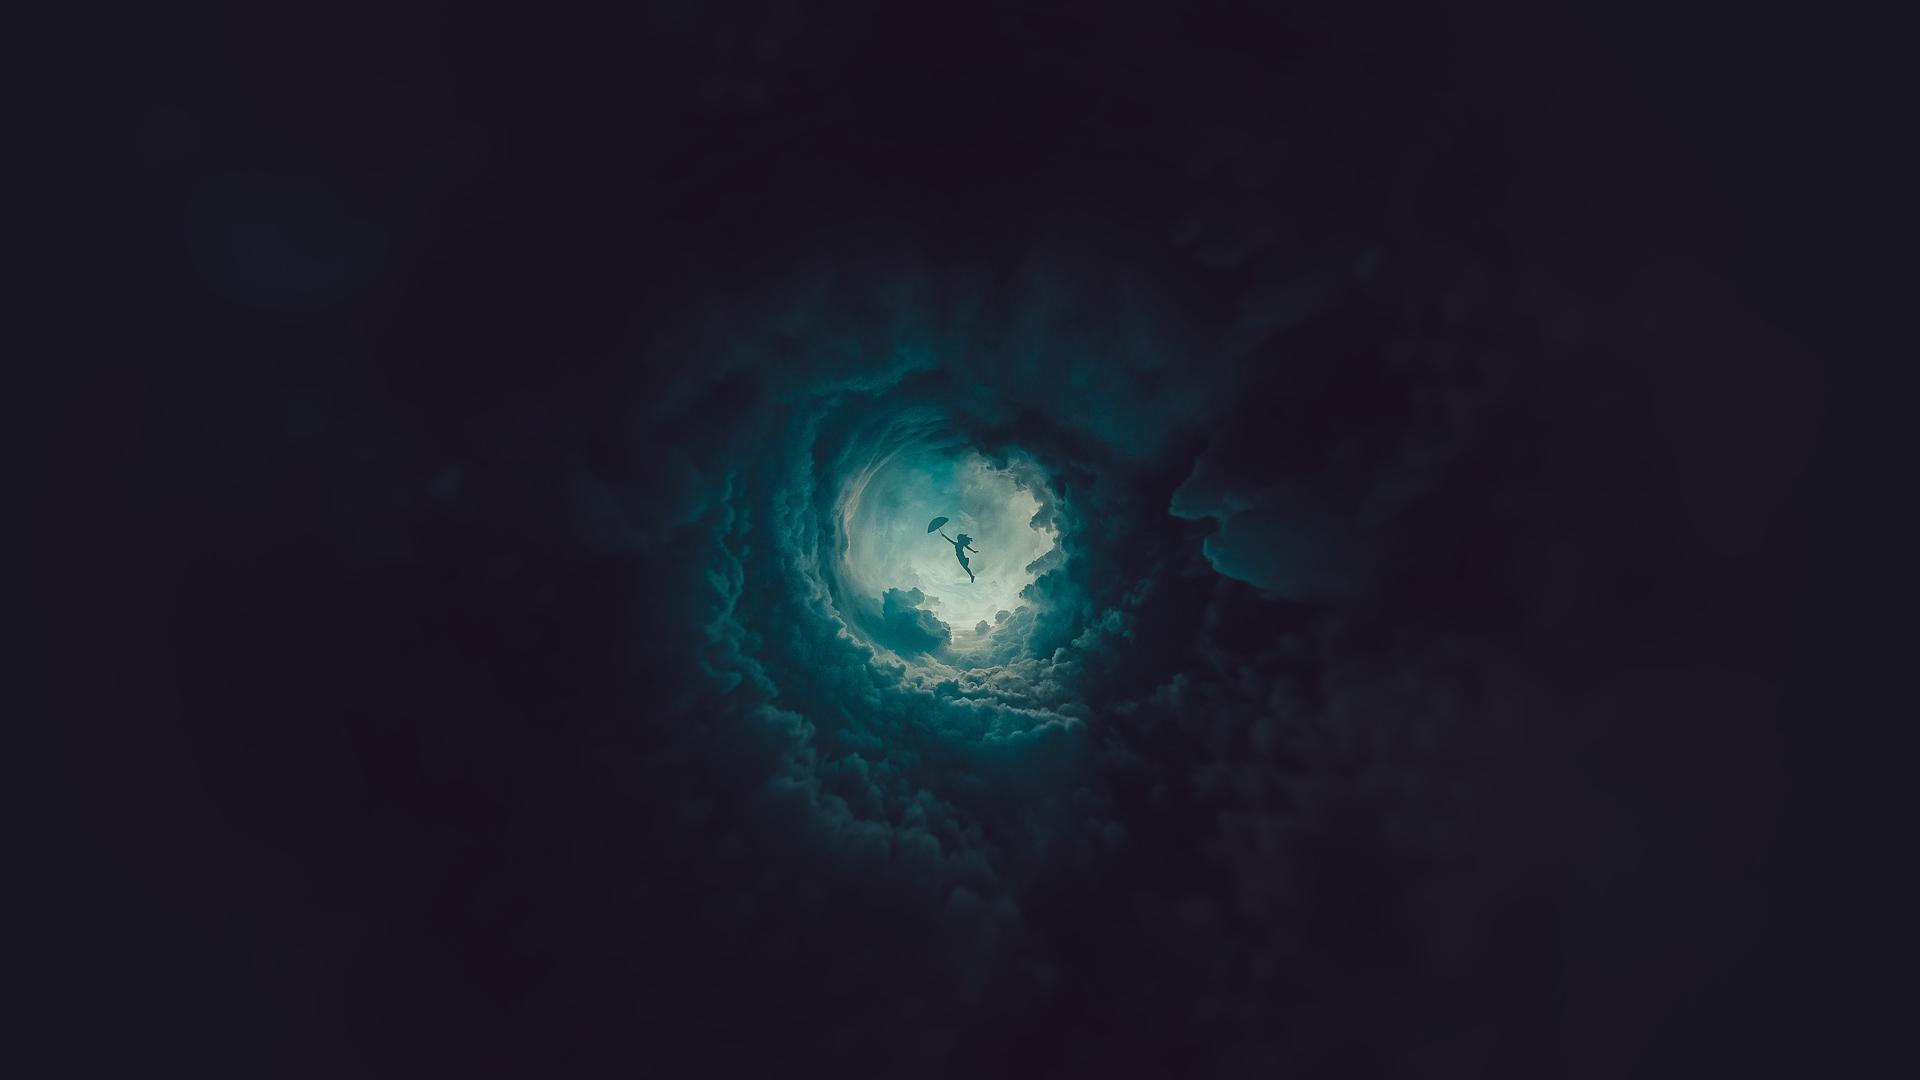 General 1920x1080 simple background sky children flying clouds digital digital art